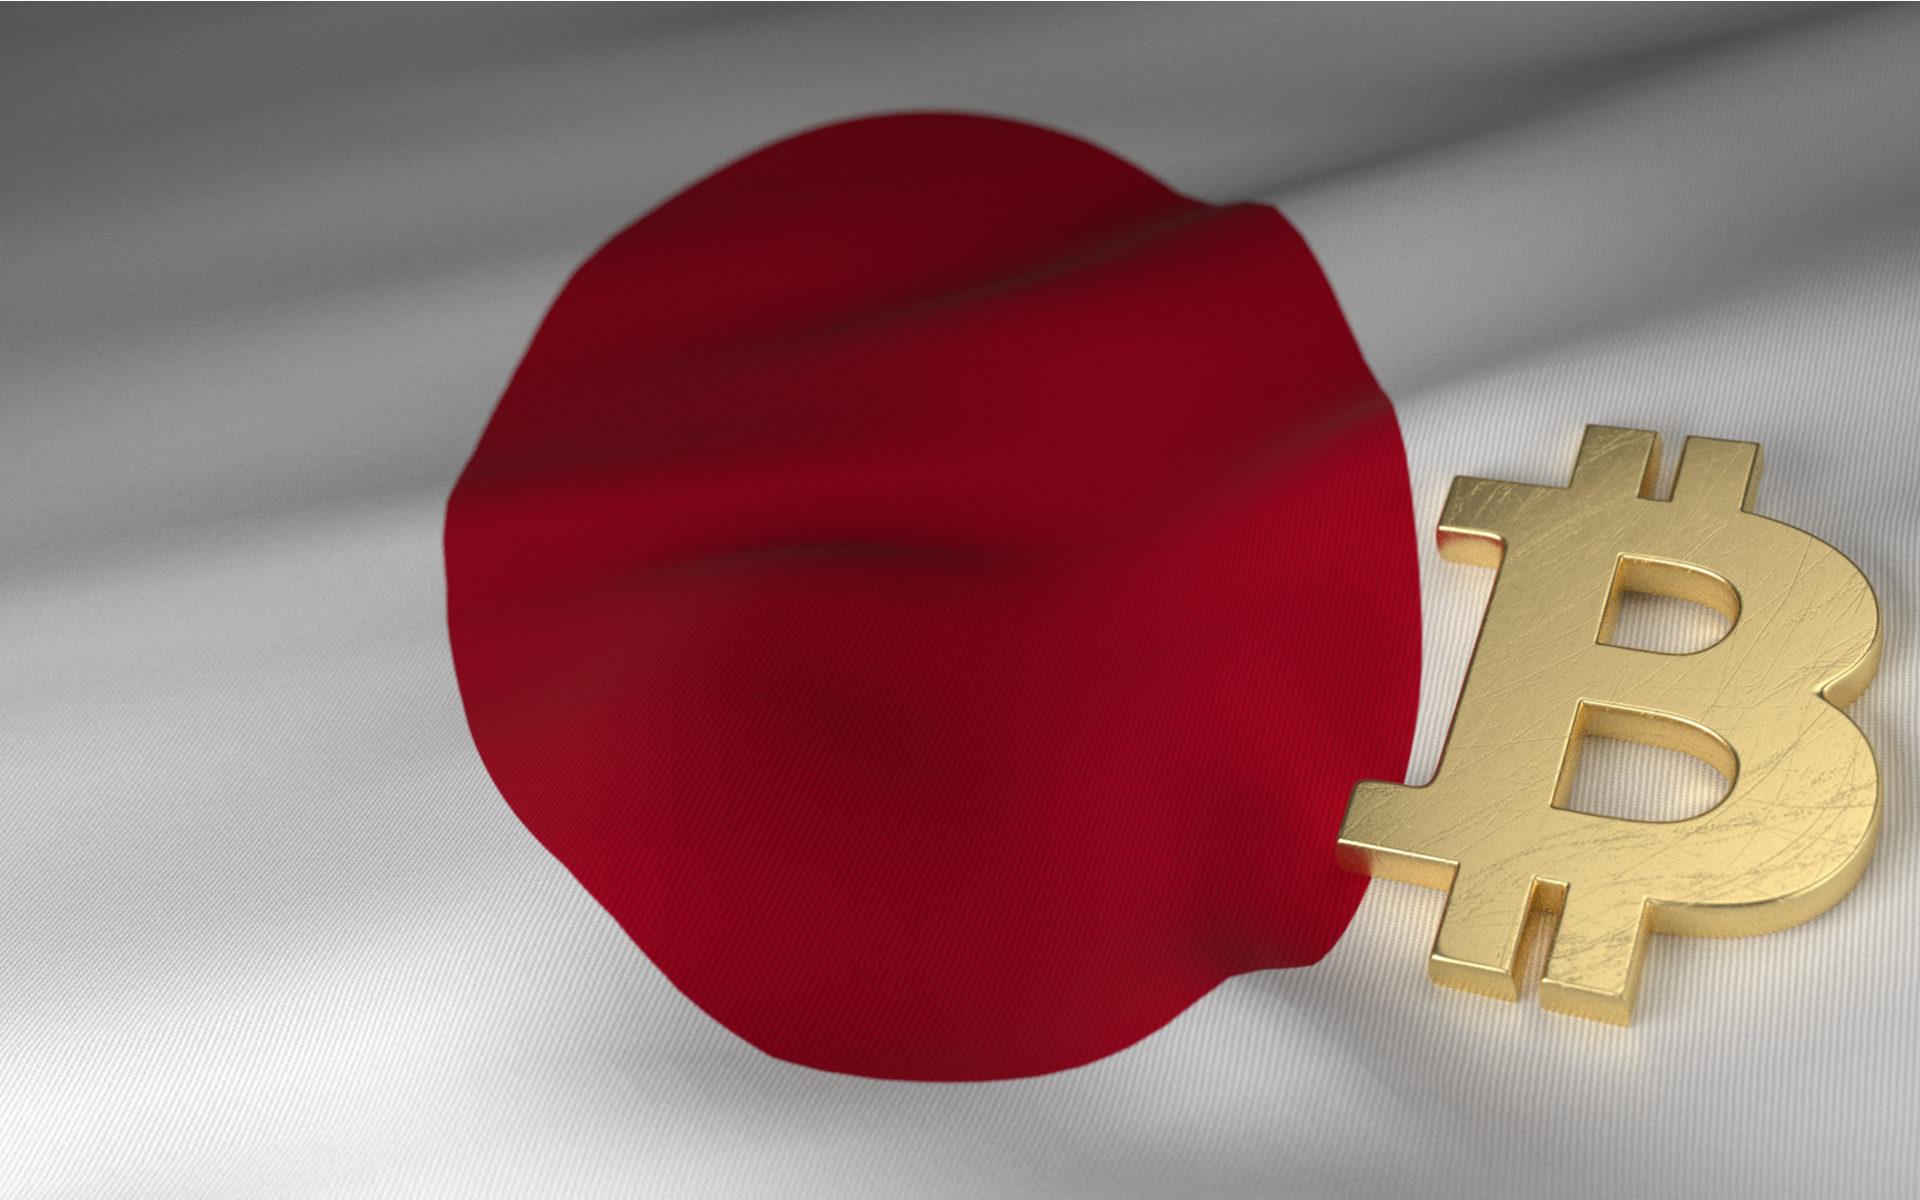 japan bitcoin adoption leader